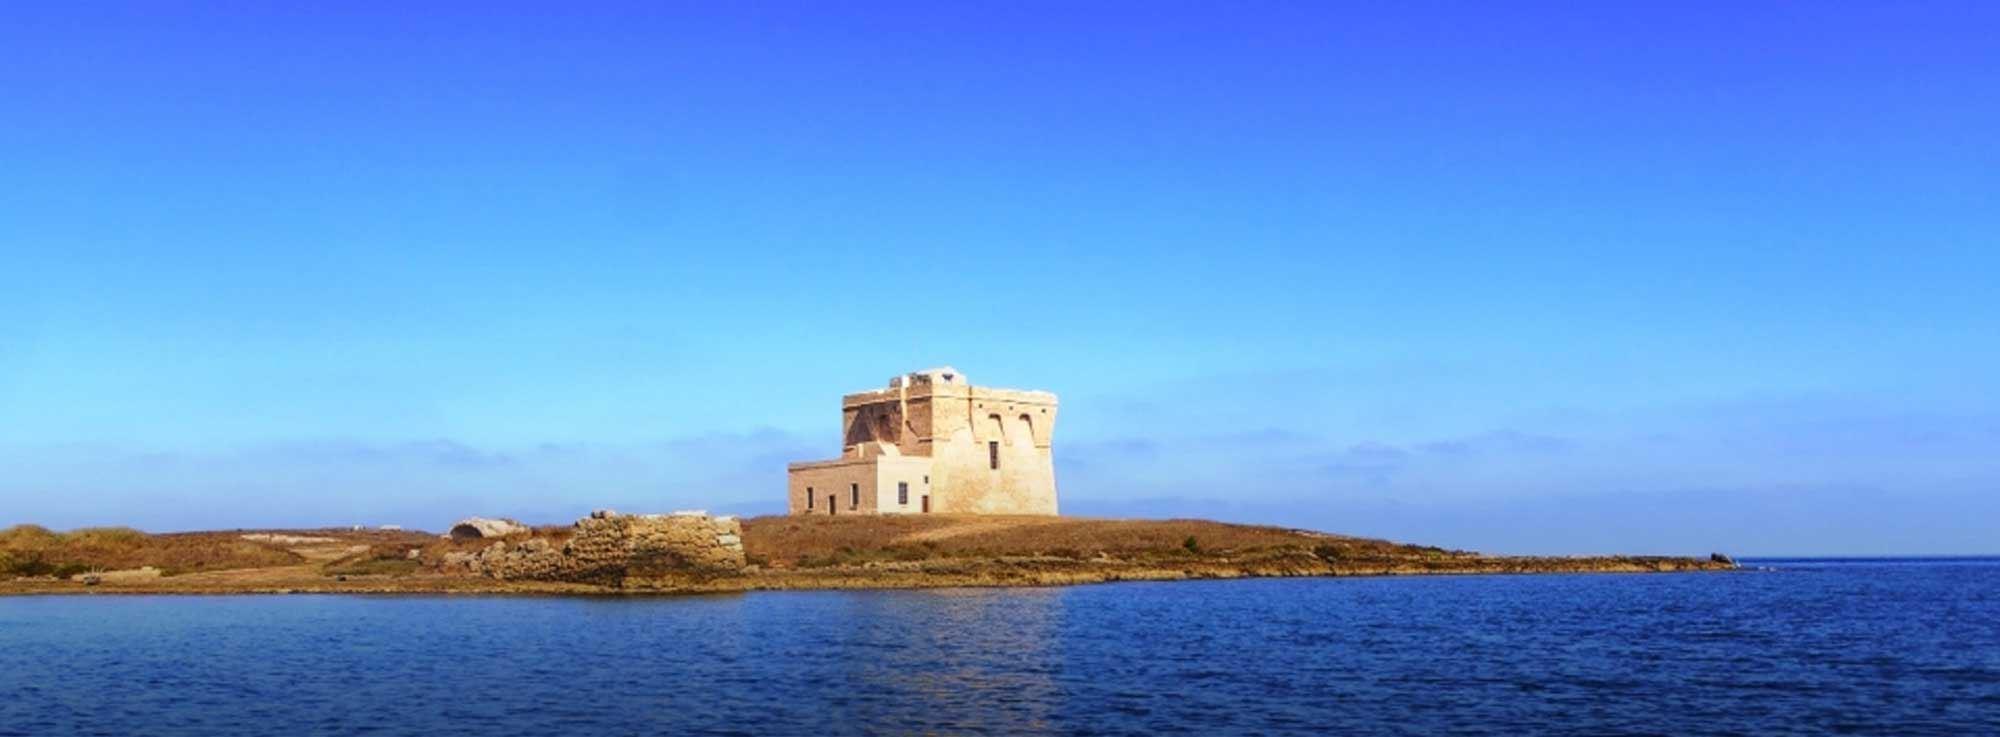 Ostuni, Torre Guaceto e Brindisi: Puglia Cycle Tours